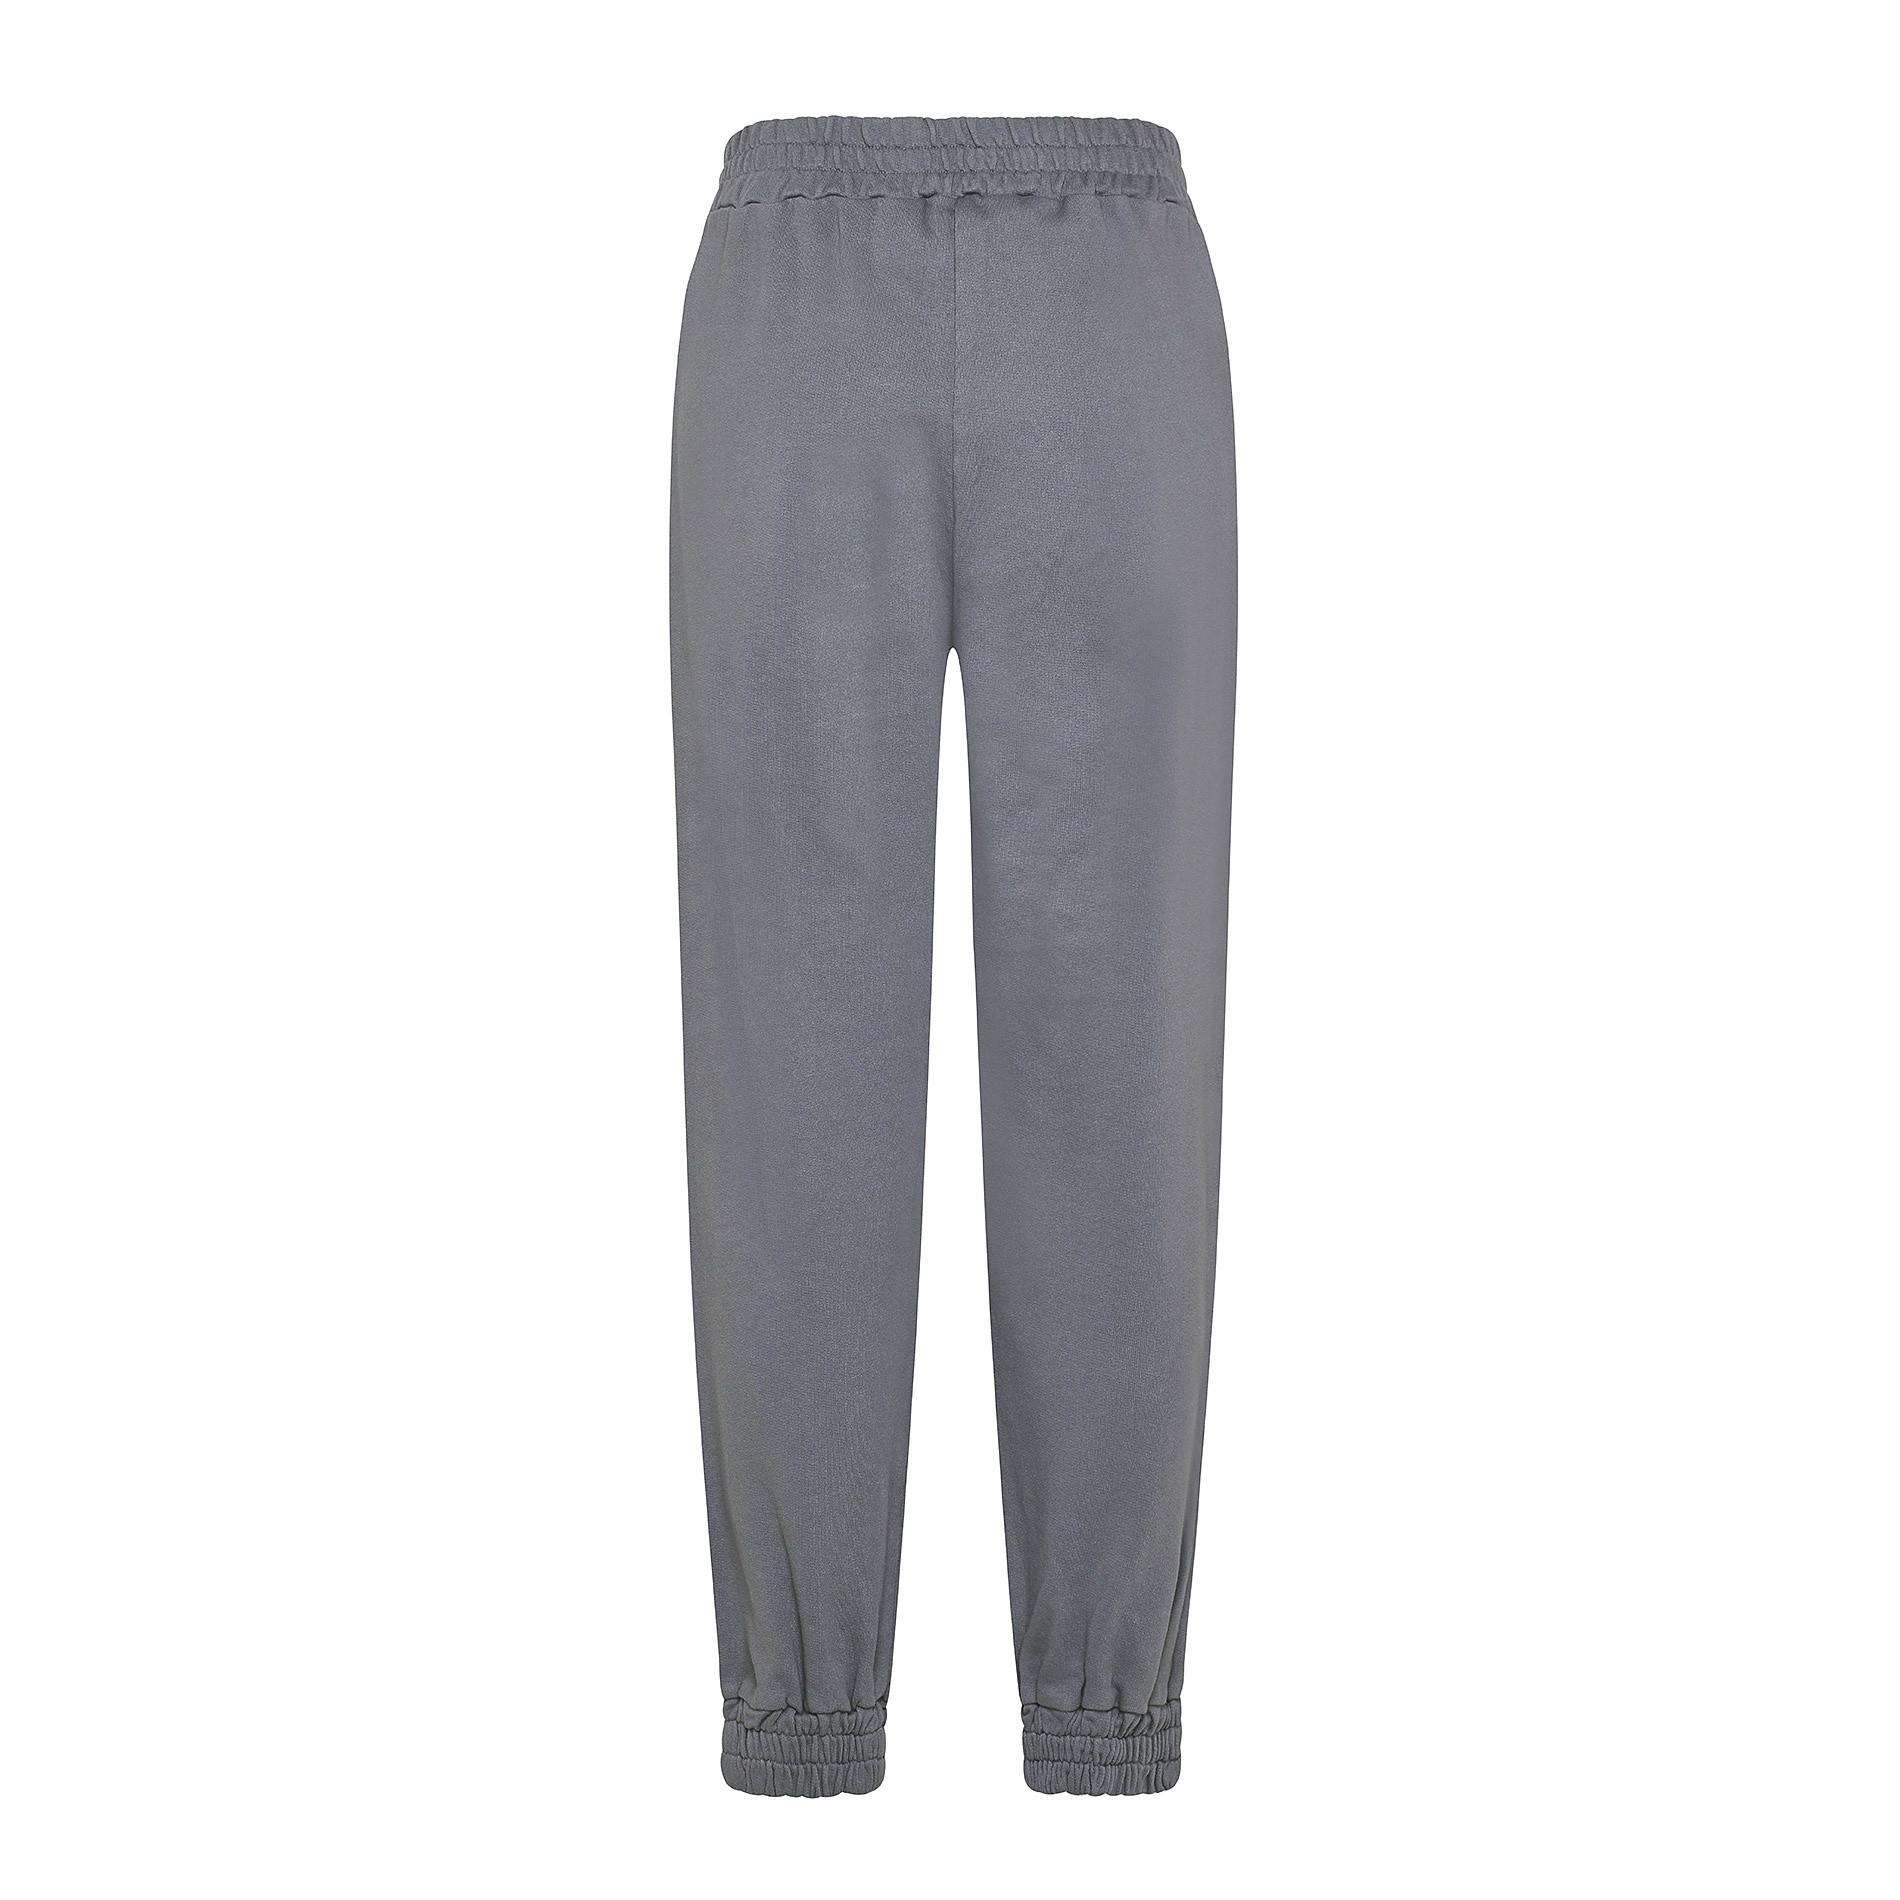 Pantalone felpa cotone biologico Koan, Grigio scuro, large image number 1